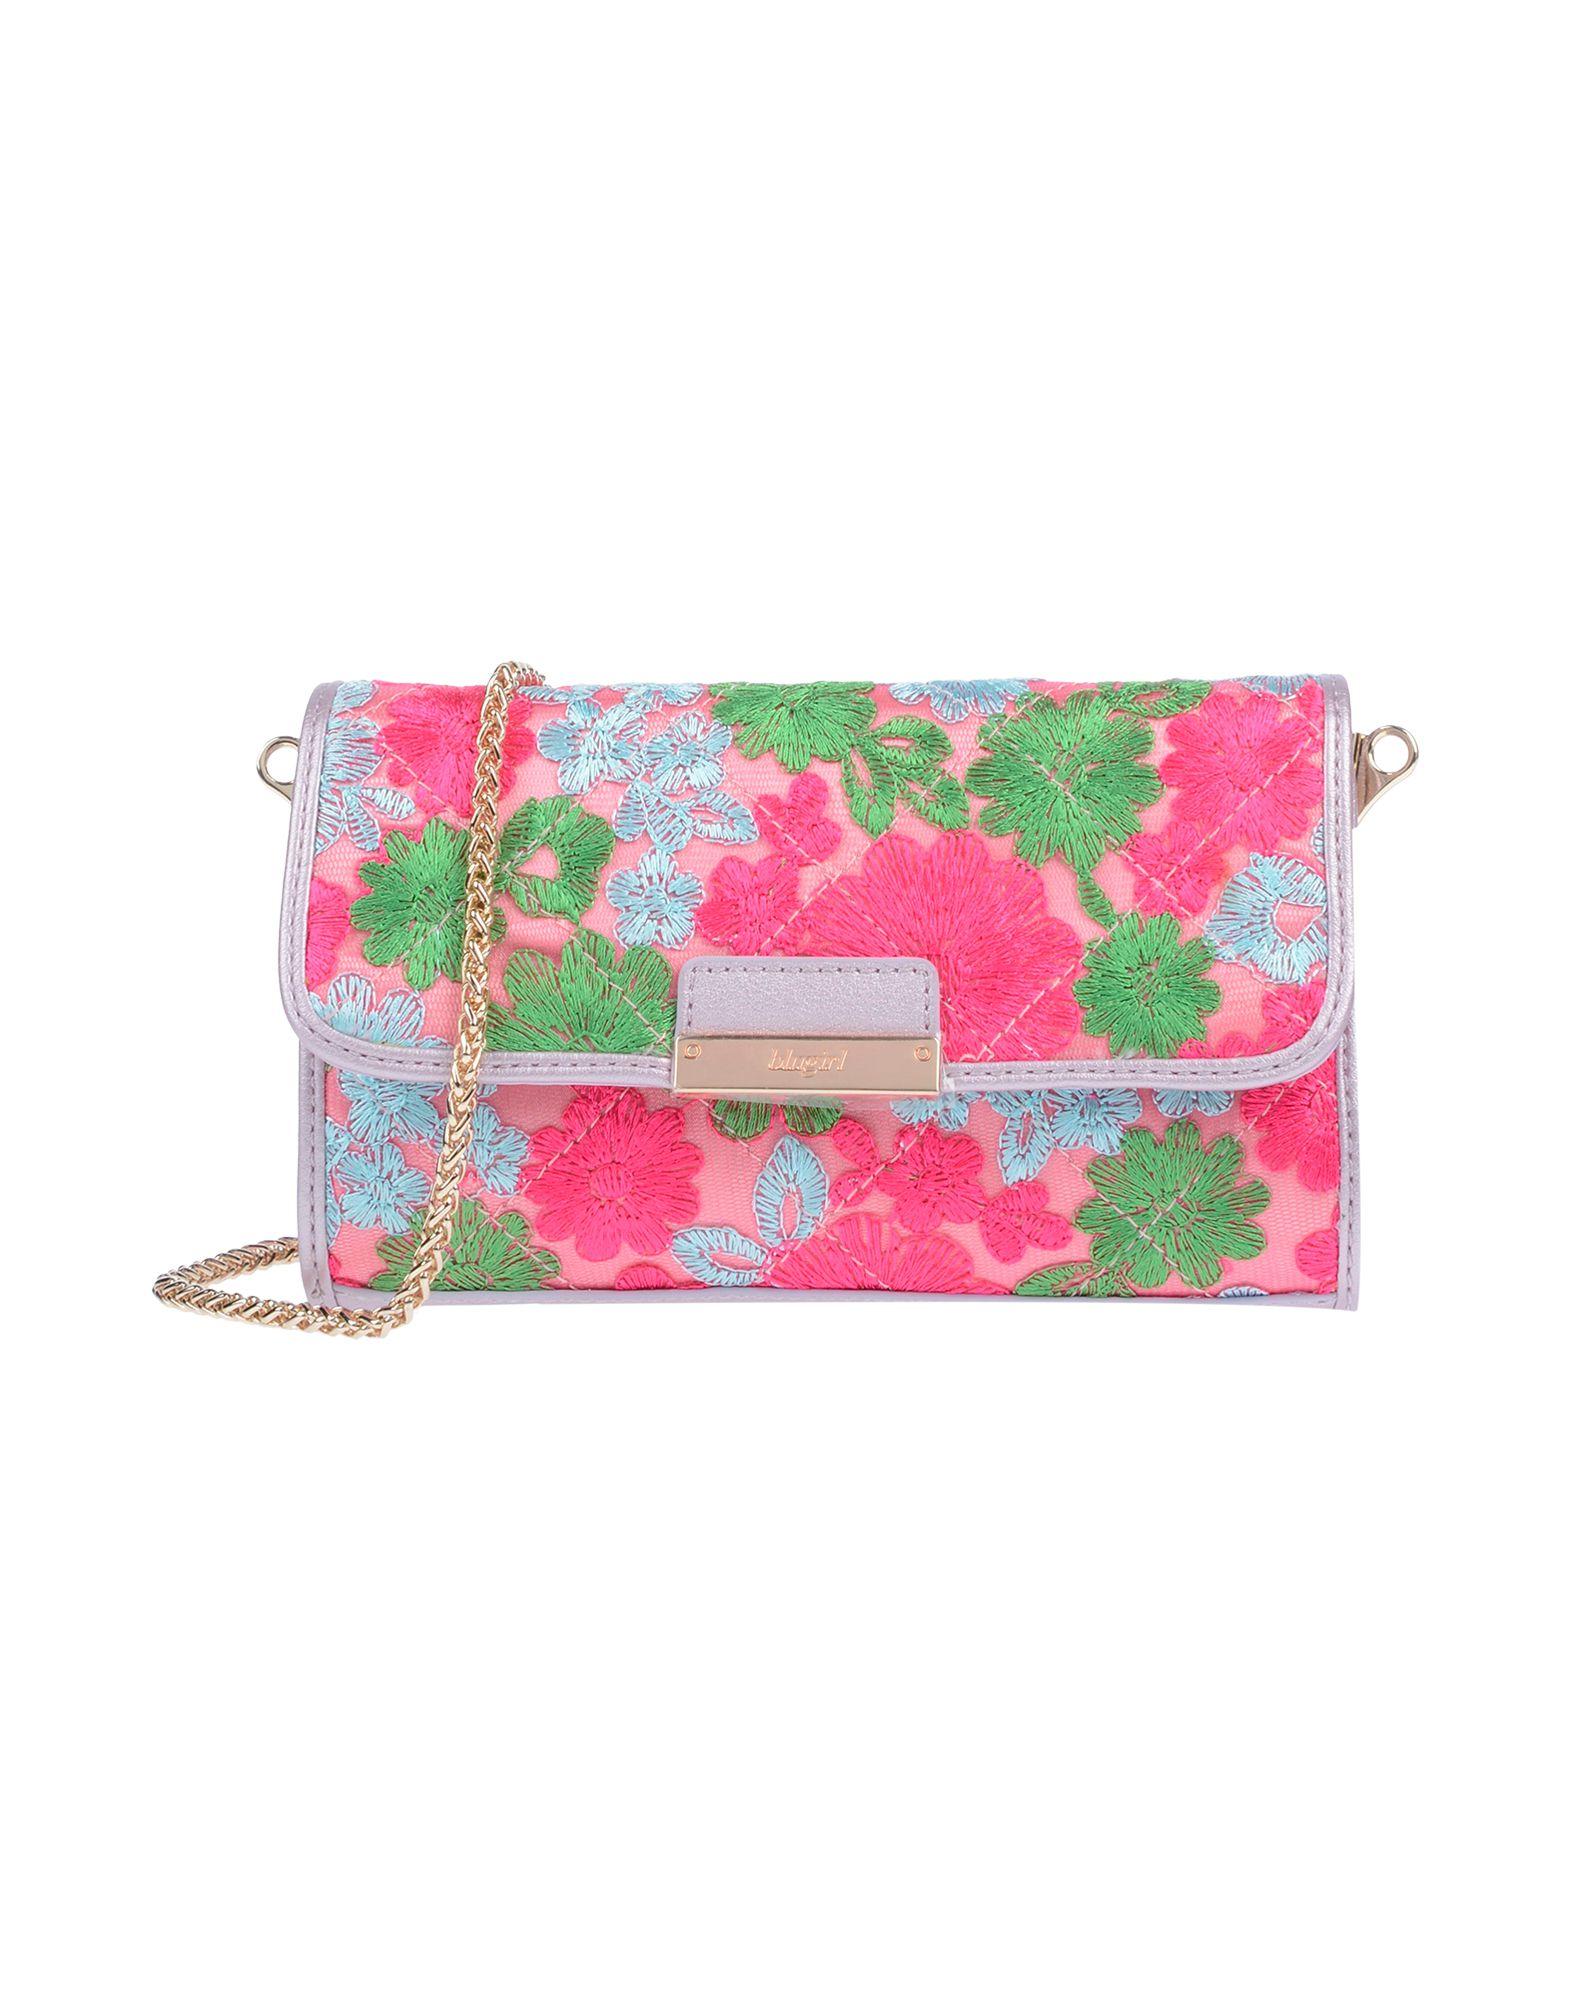 eebc6de70 Blugirl Blumarine Women's Handbags - Spring-Summer and Fall-Winter  Collections | YOOX